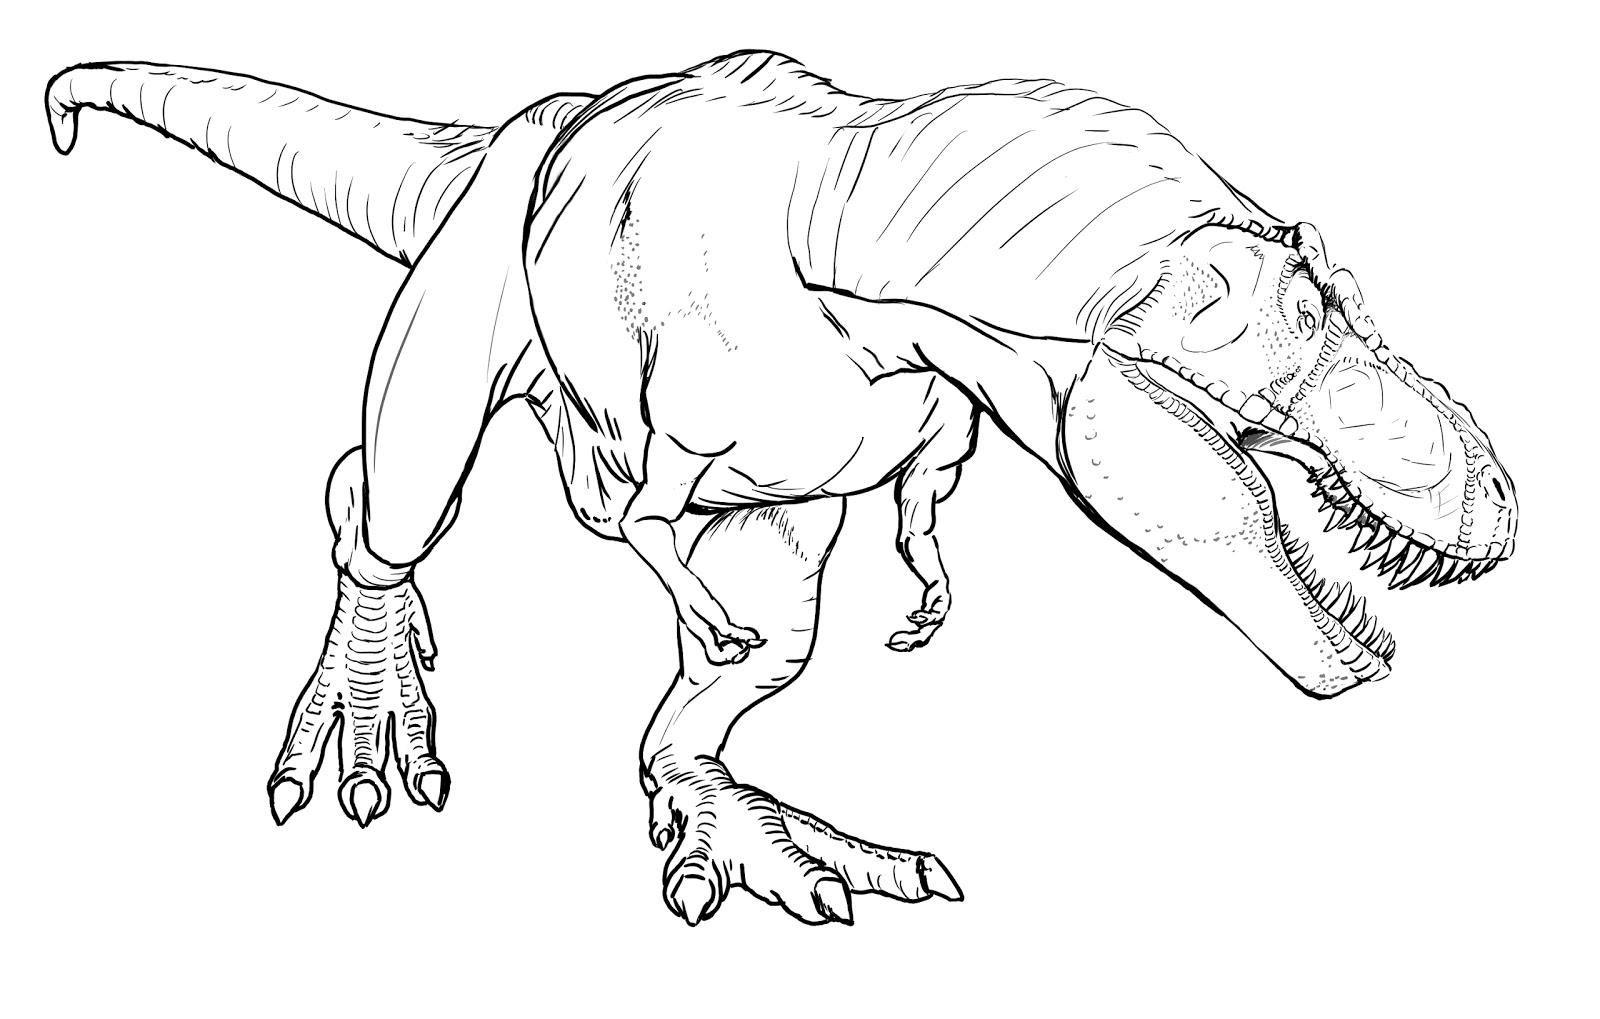 T Rex Coloring Sheets Coloring Book Free T Rex Coloring Pages Book Pdfinosaur Dinosaur Coloring Pages Minion Coloring Pages Dog Coloring Page